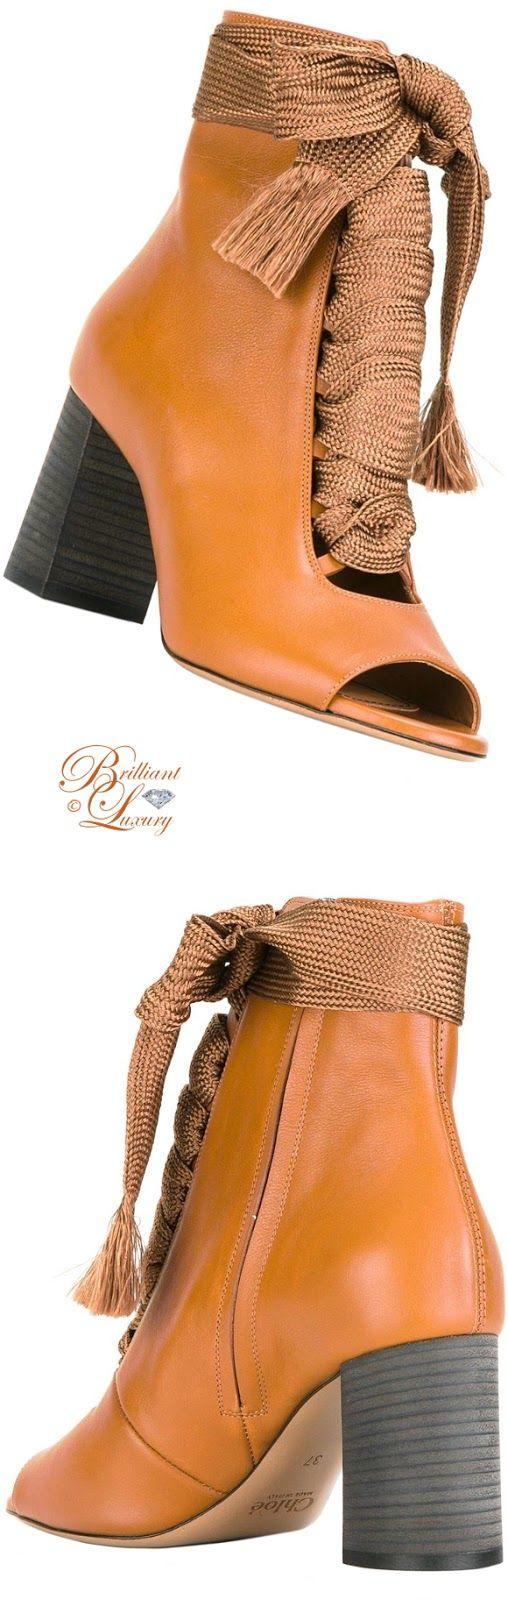 Brilliant Luxury by Emmy DE ♦ Chloé Harper Booties